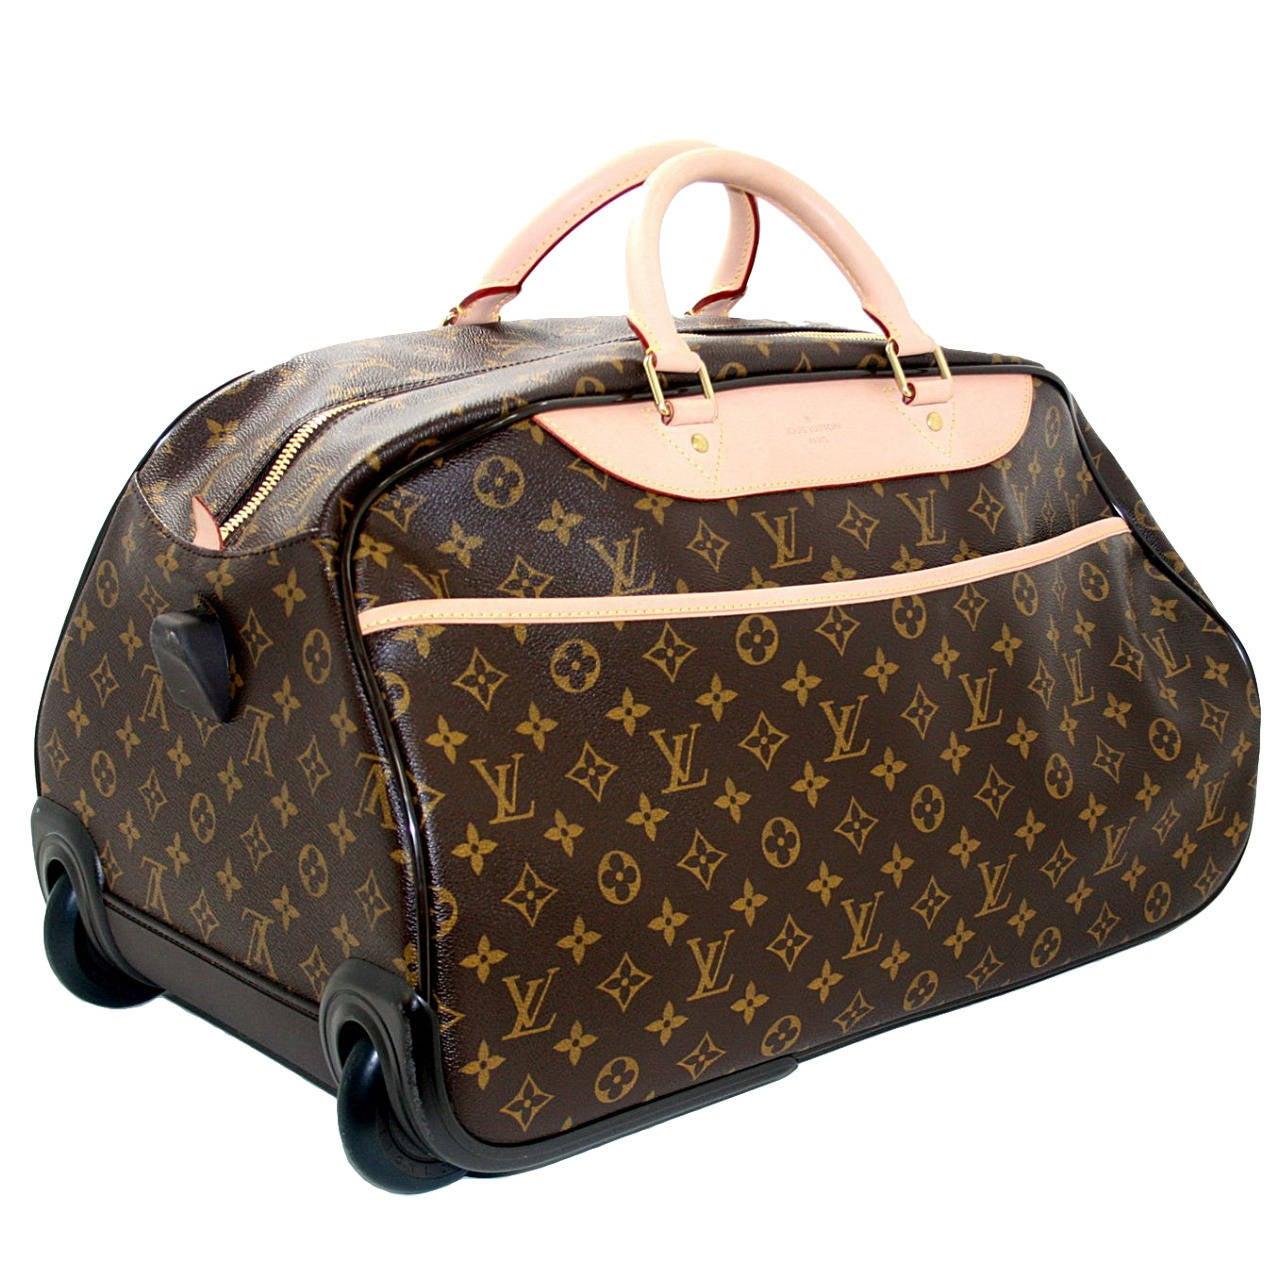 Louis Vuitton Monogram Eole 50 Rolling Travel Duffel Bag